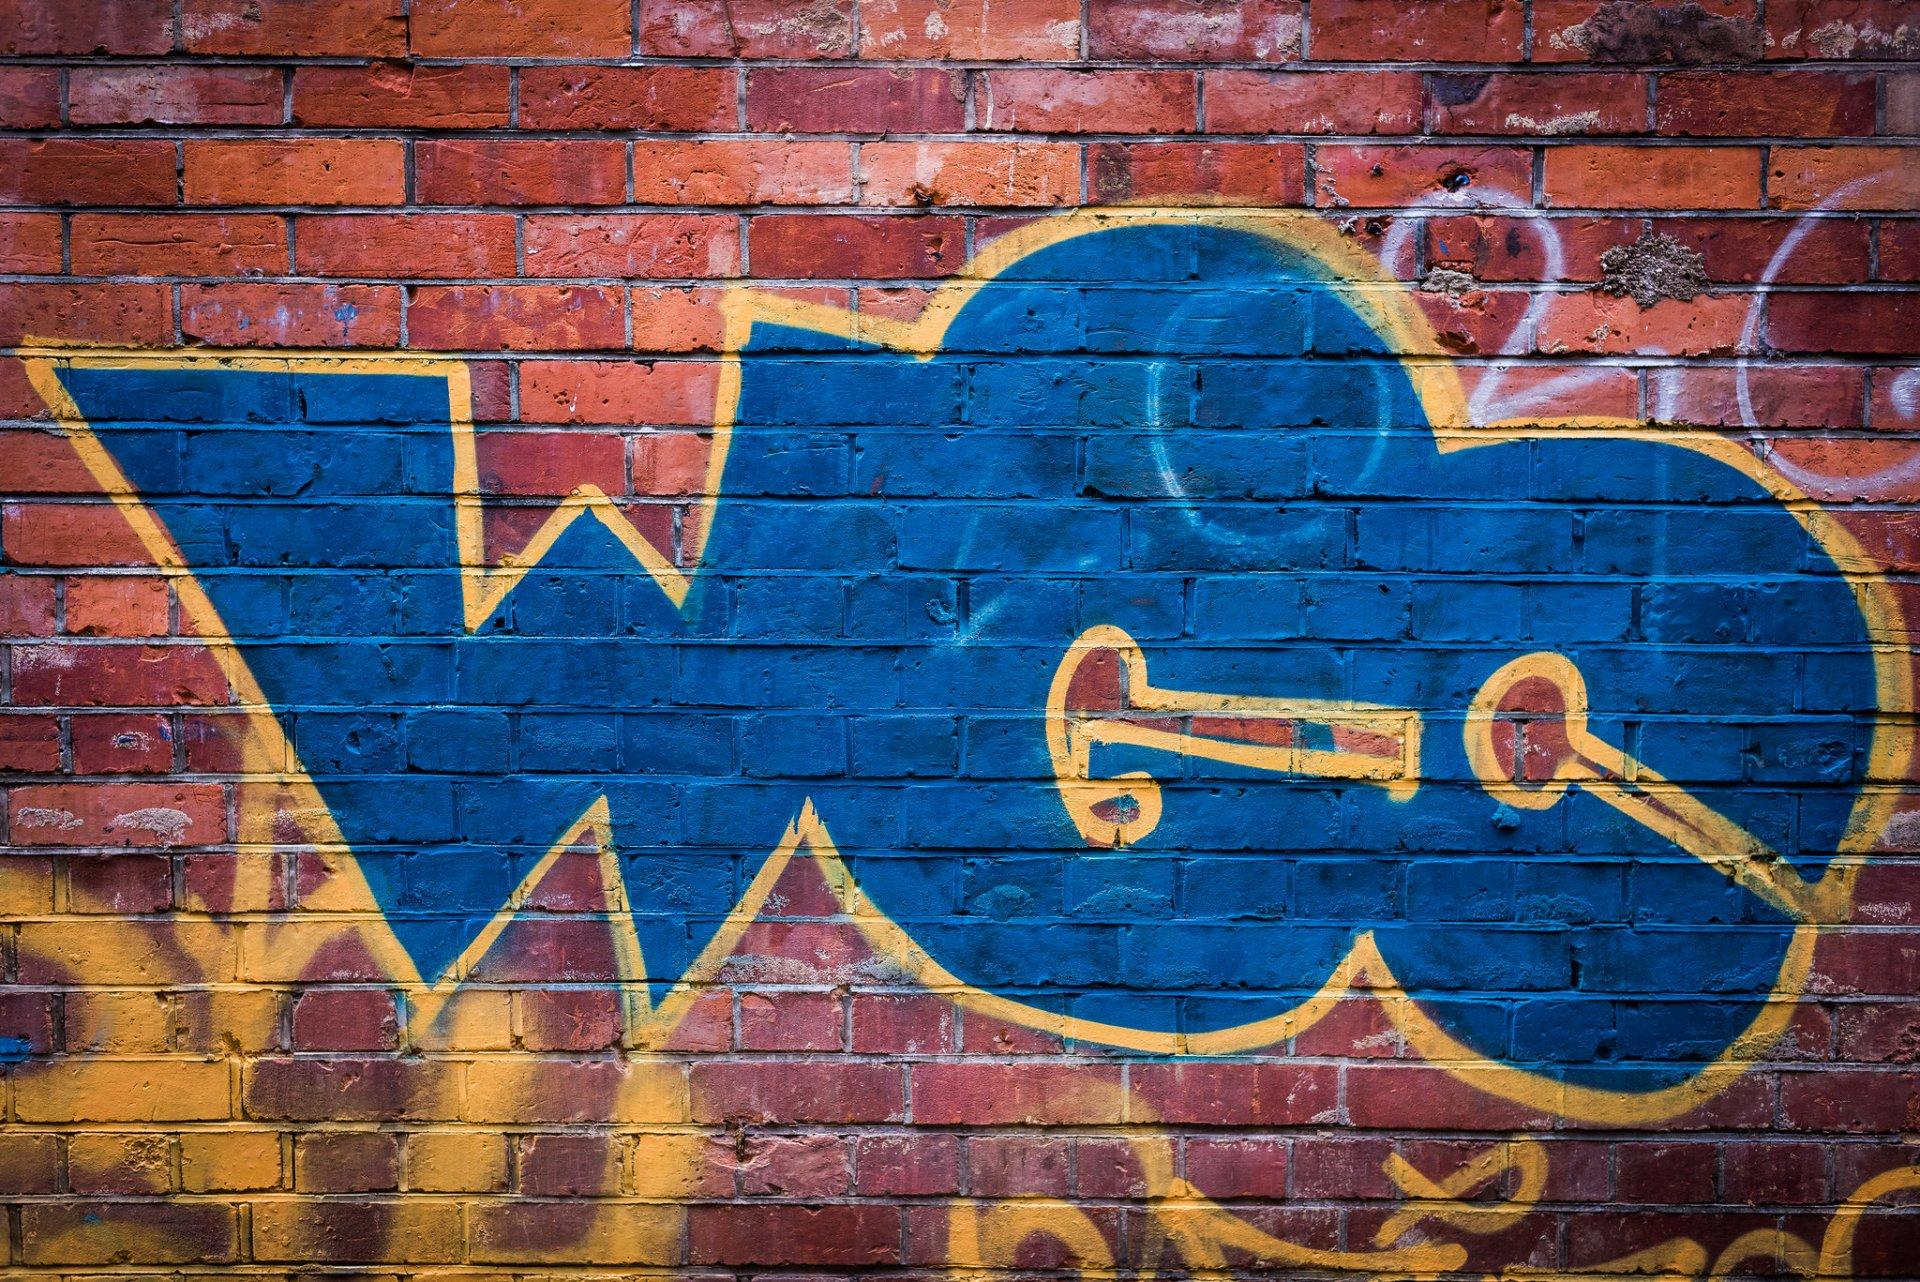 Обои графити. Текстуры foto 12